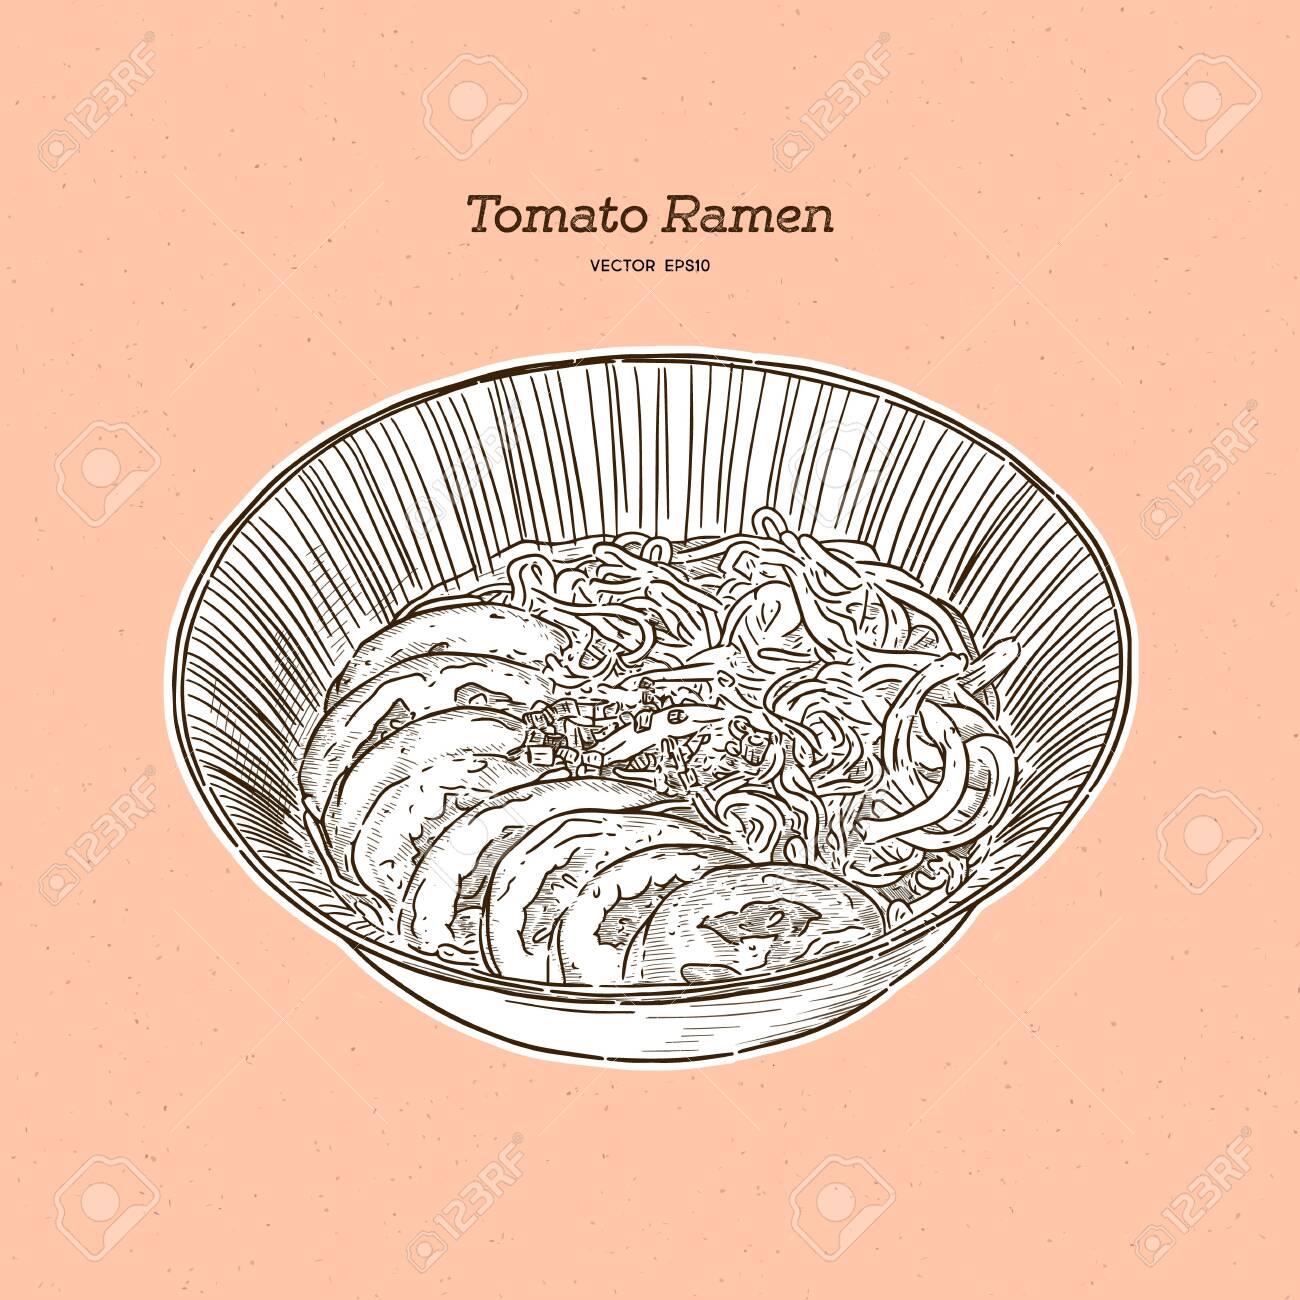 Tomato ramen for vegeterian, hand draw sketch vector. - 149315120